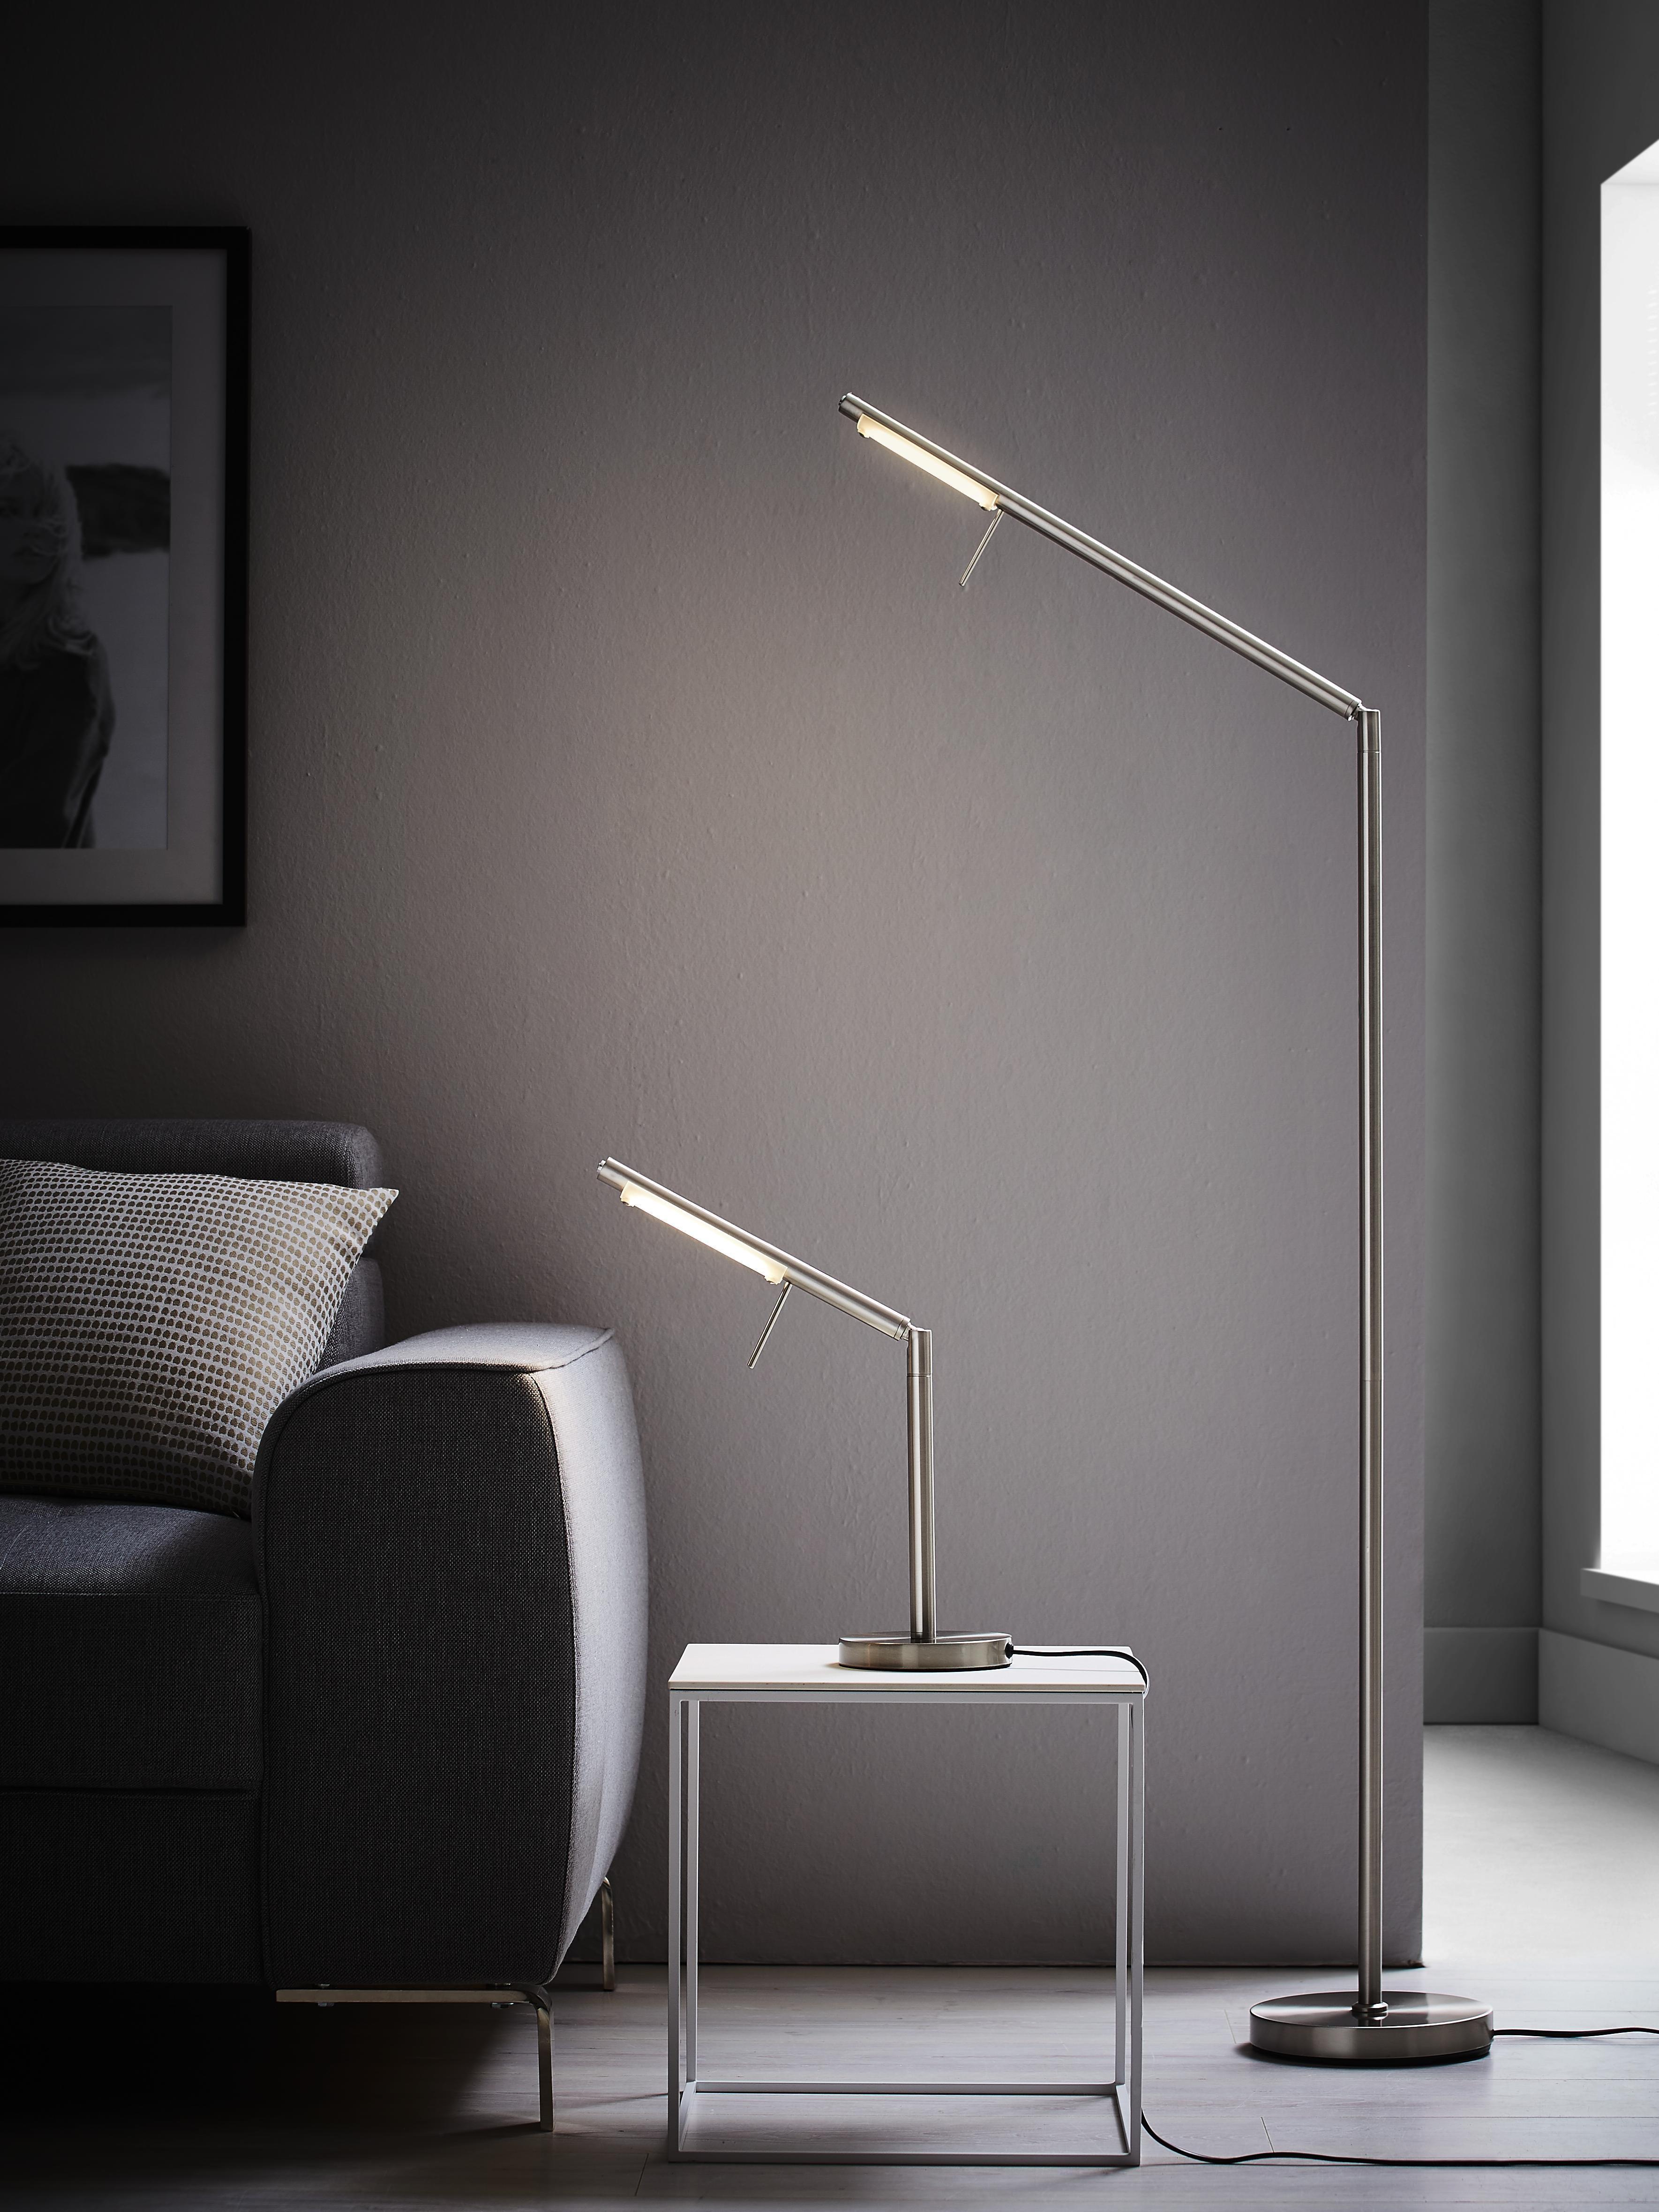 Geschickt Led Stehleuchte Bogenleuchte Lese Leuchte Bogenlampe Stehlampe Dimmbar 165cm Büromöbel